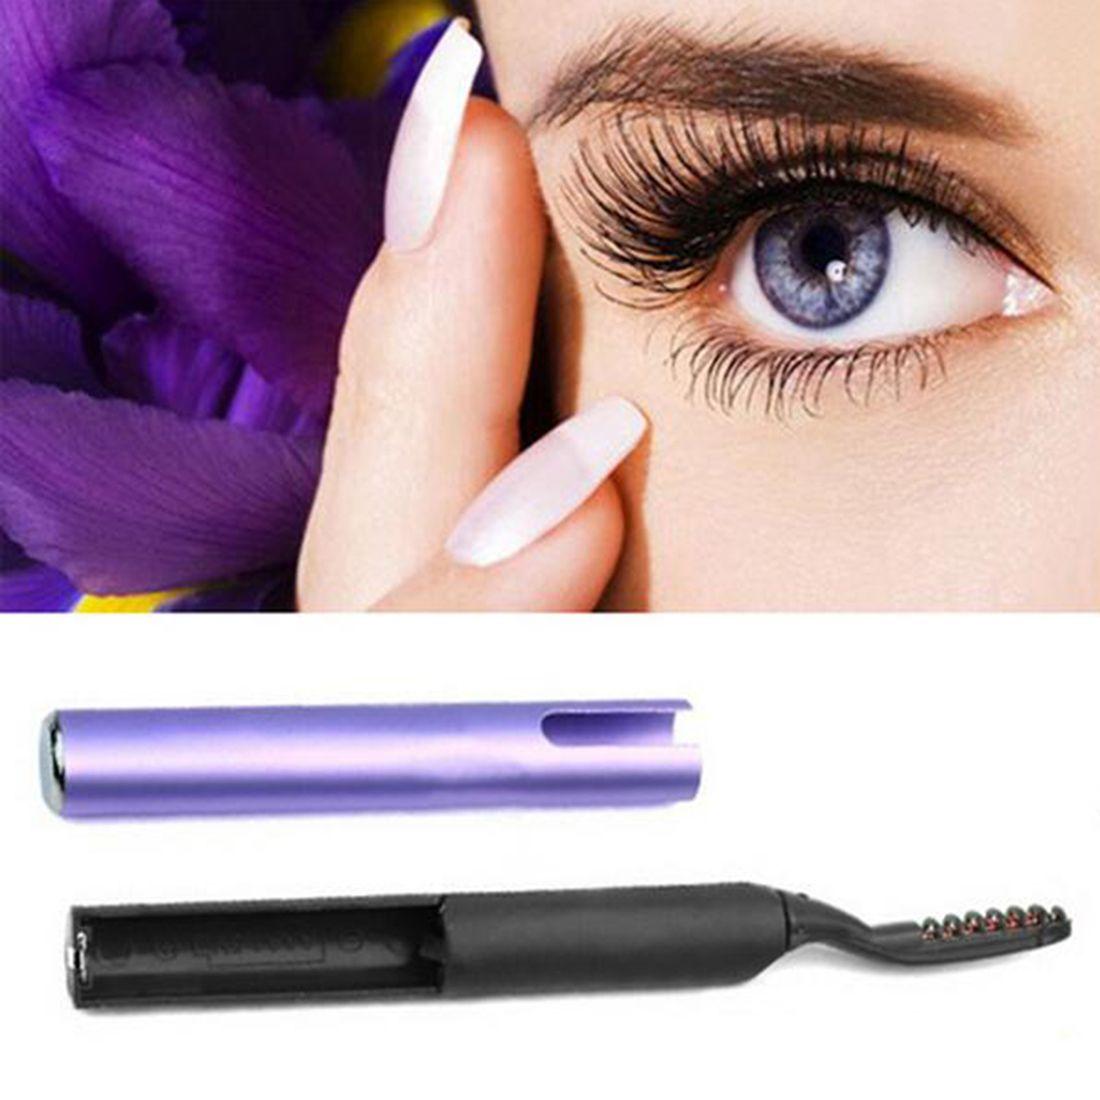 Wholesale 2016 Hot Sale Brush Curler Heating Eyelash Brush Beauty